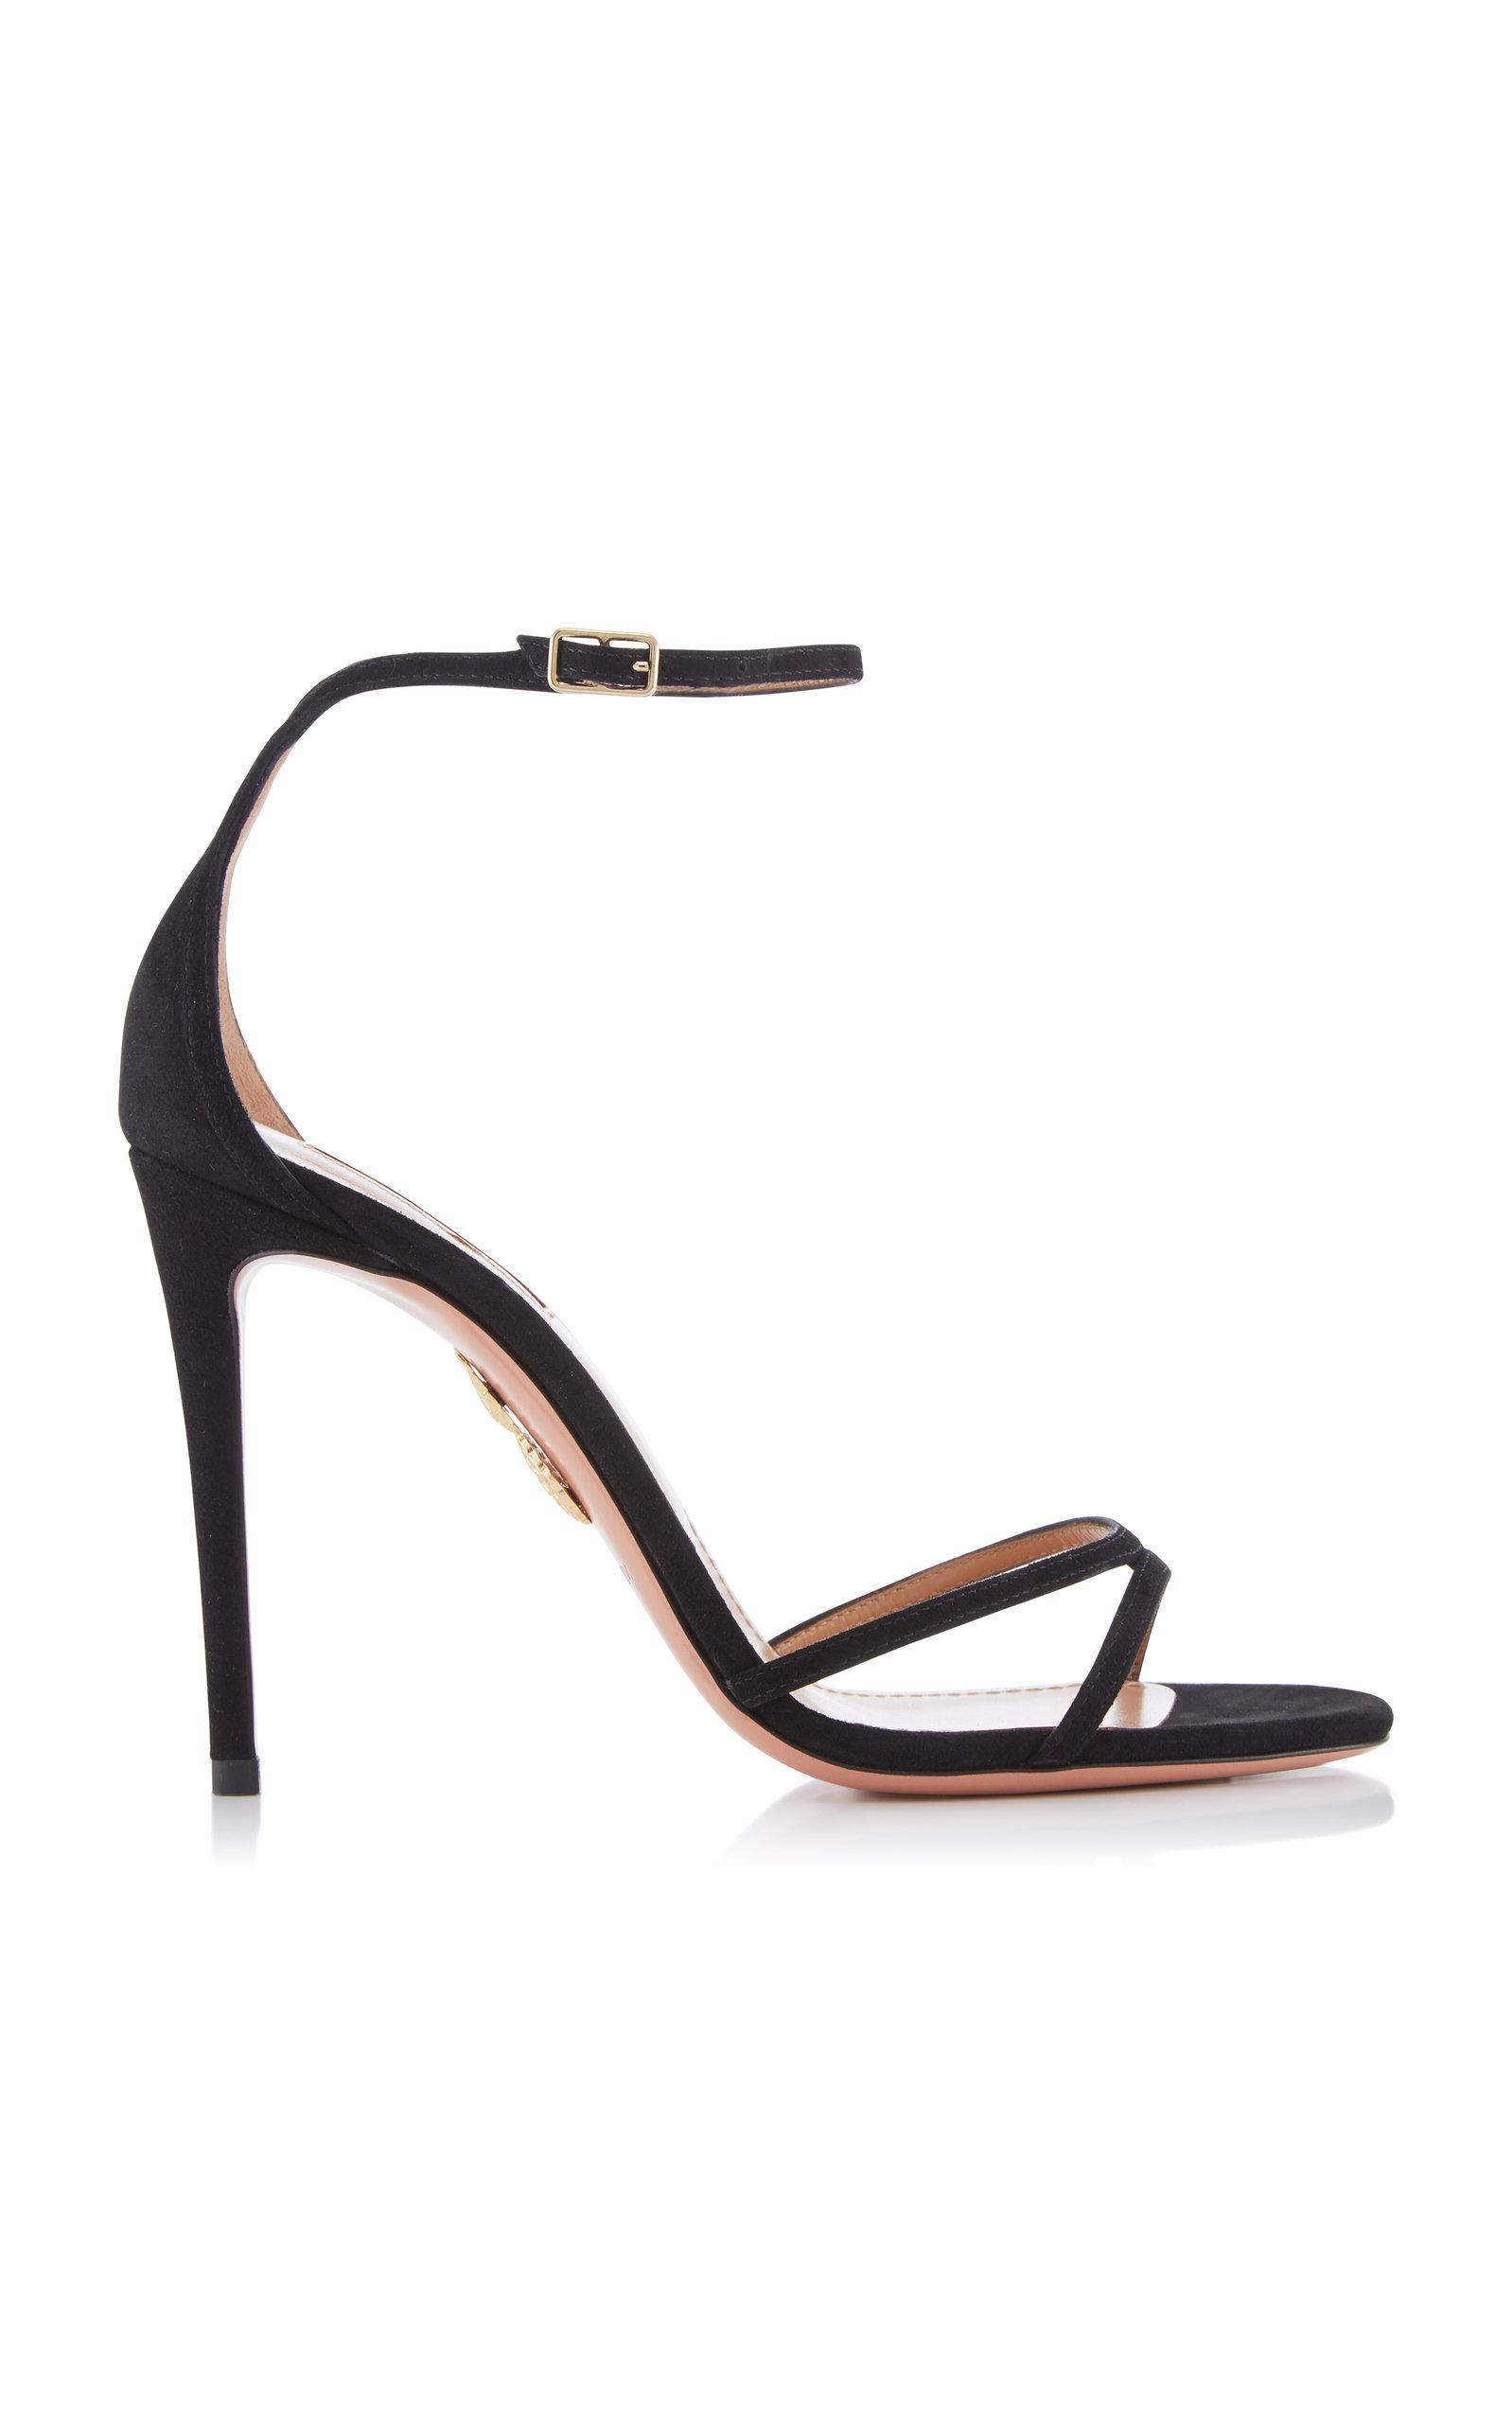 6408fa9ffdf Lyst - Aquazzura Purist Suede Sandals in Black